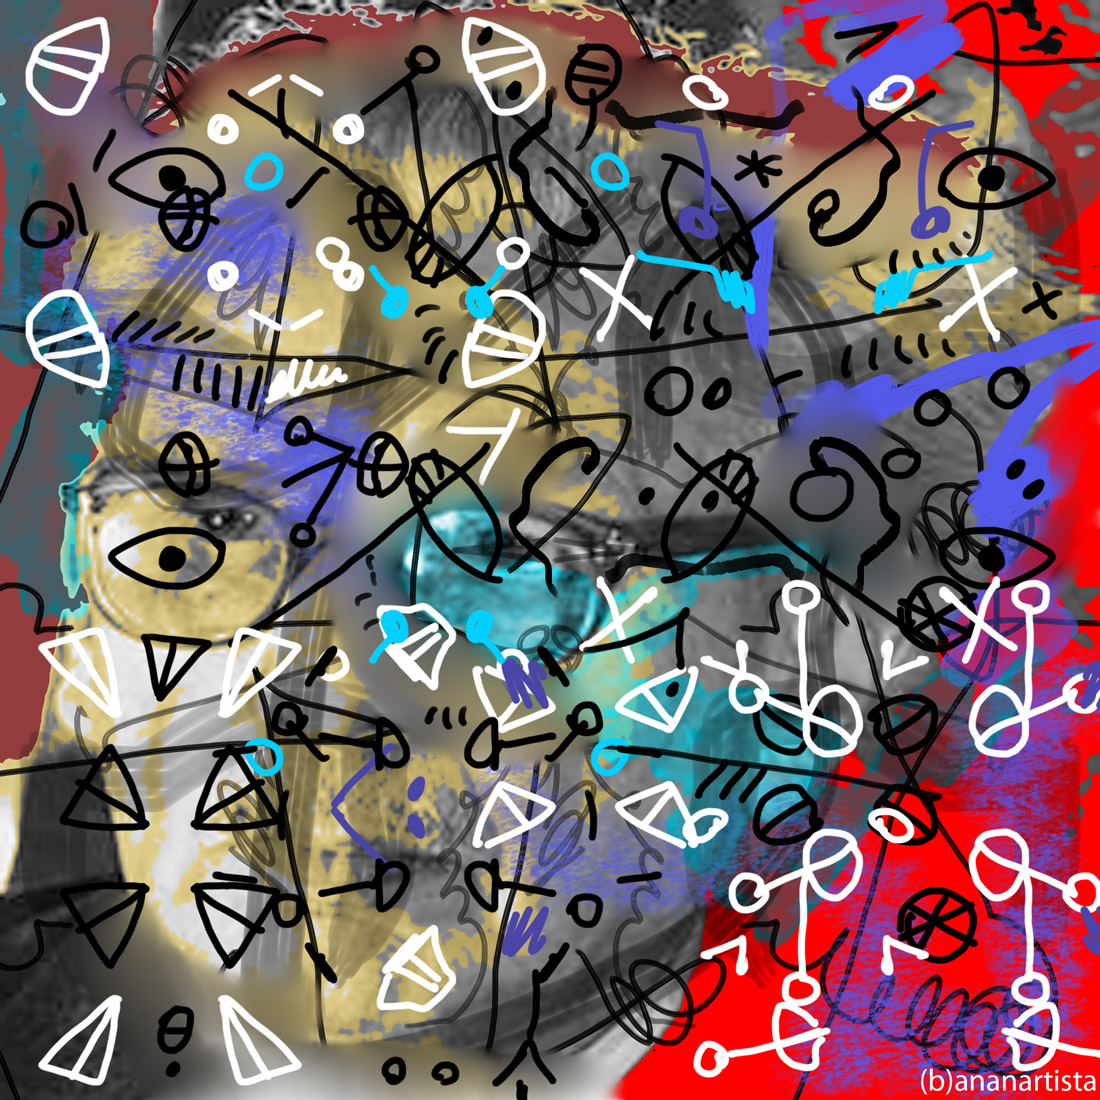 ludwig binswanger: digital portrait by (b)ananartista sbuff